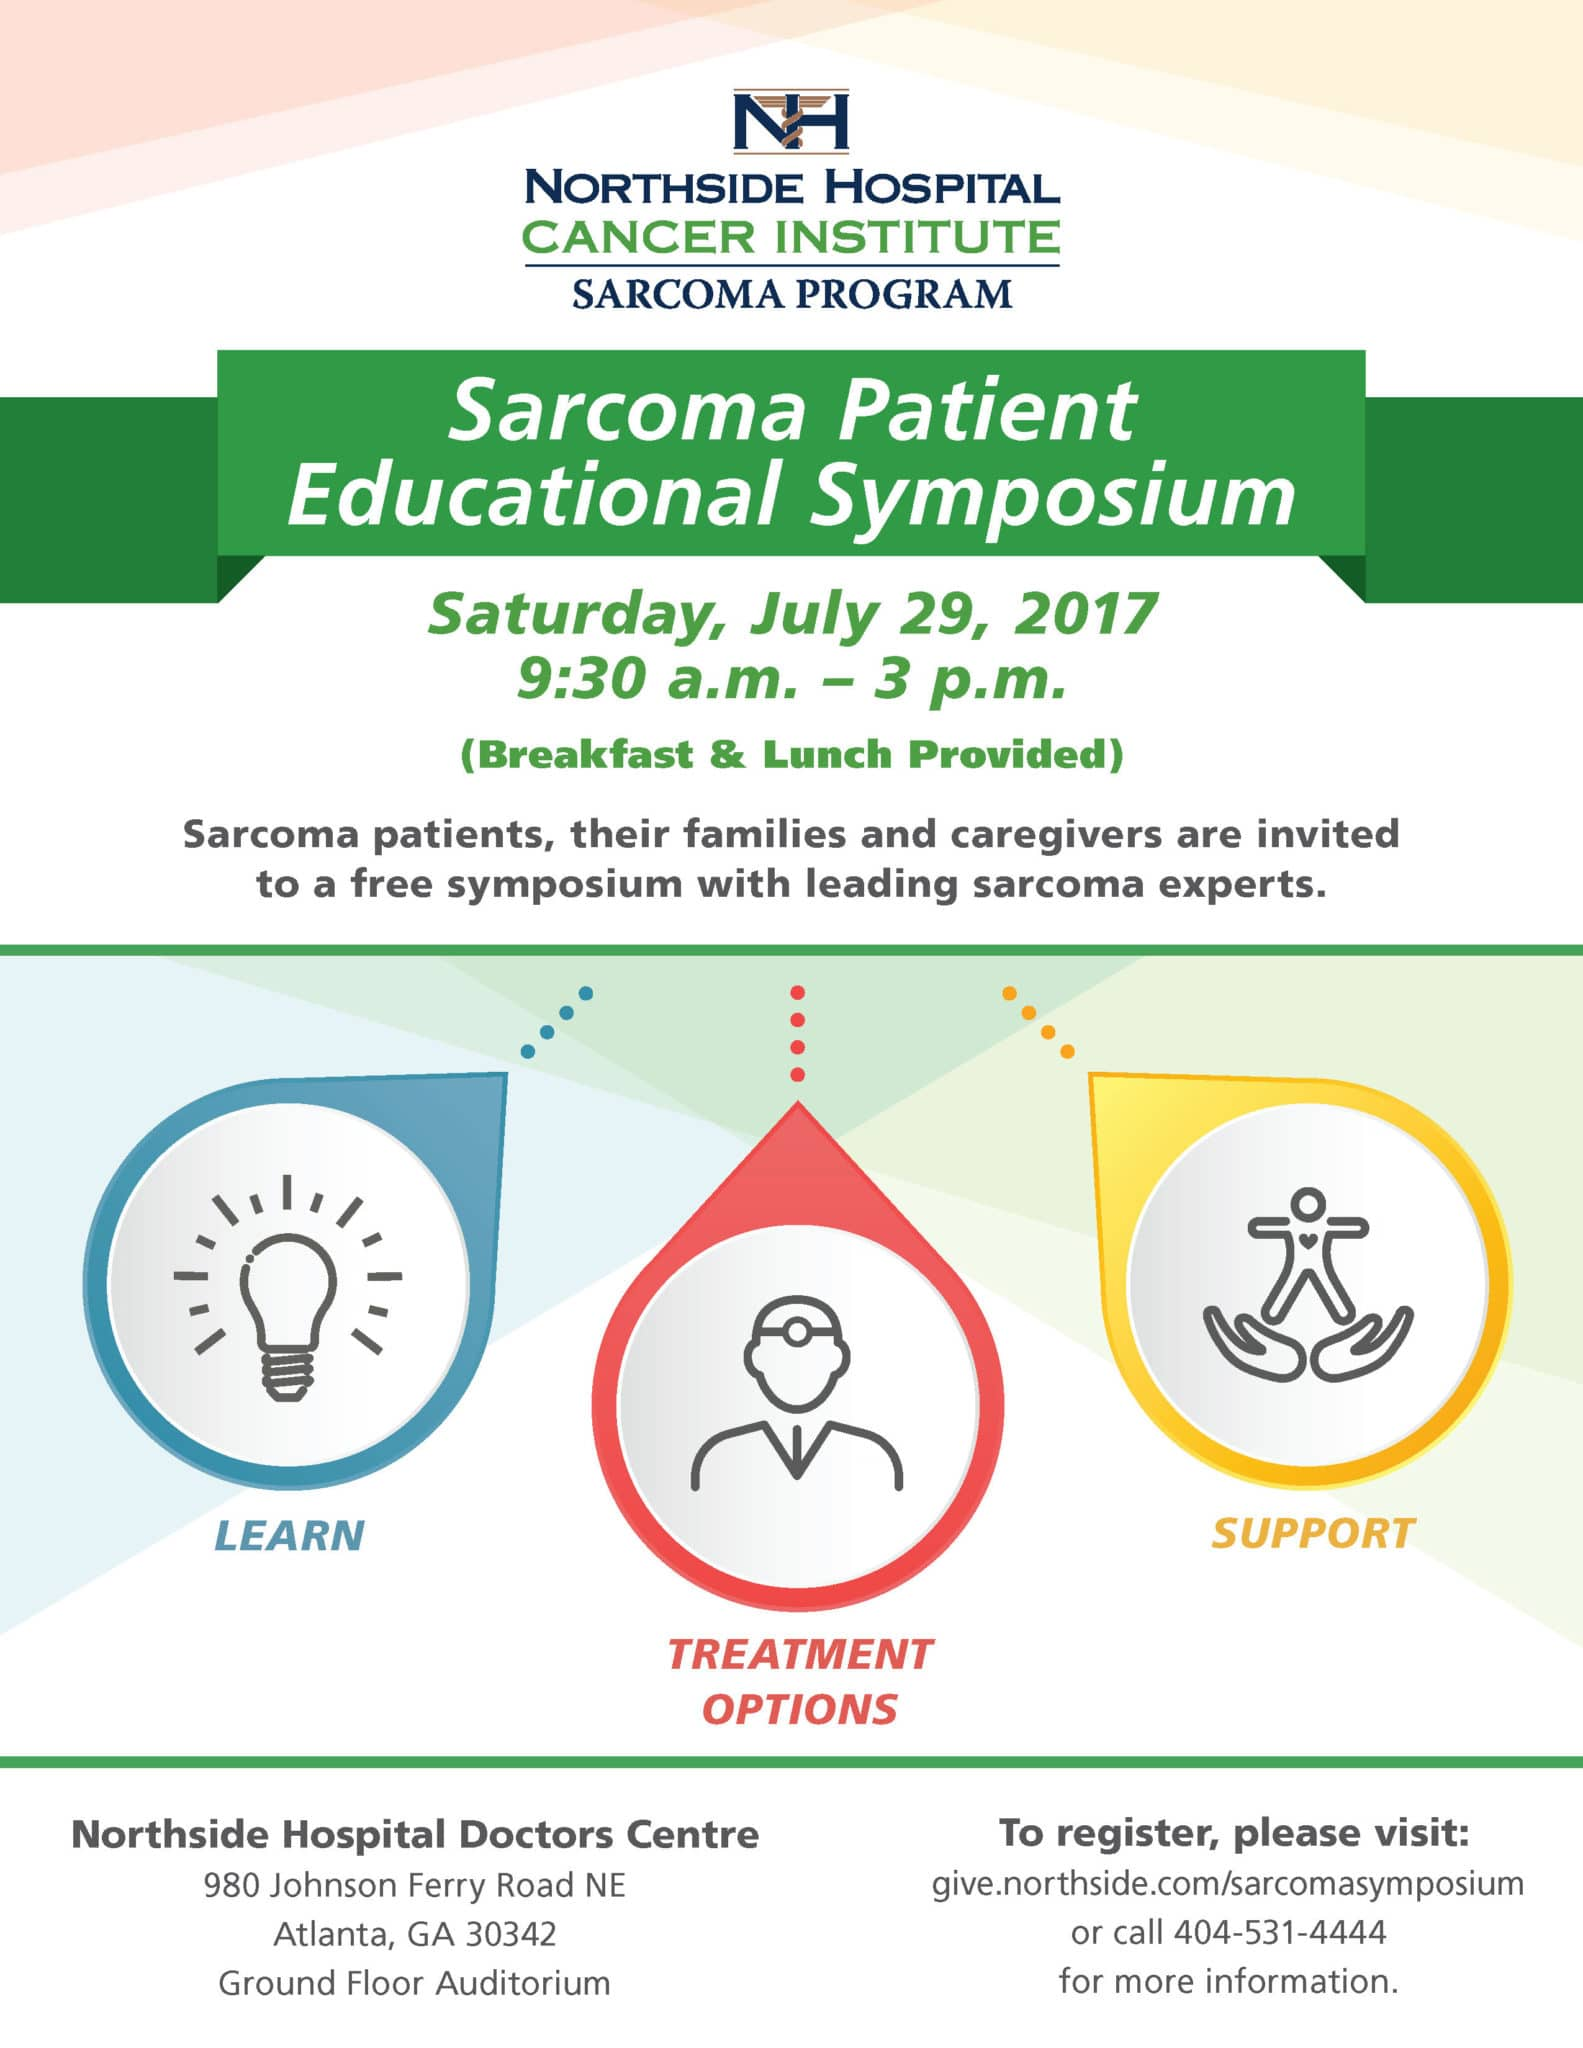 Northside Hospital Sarcoma Patient Educational Symposium